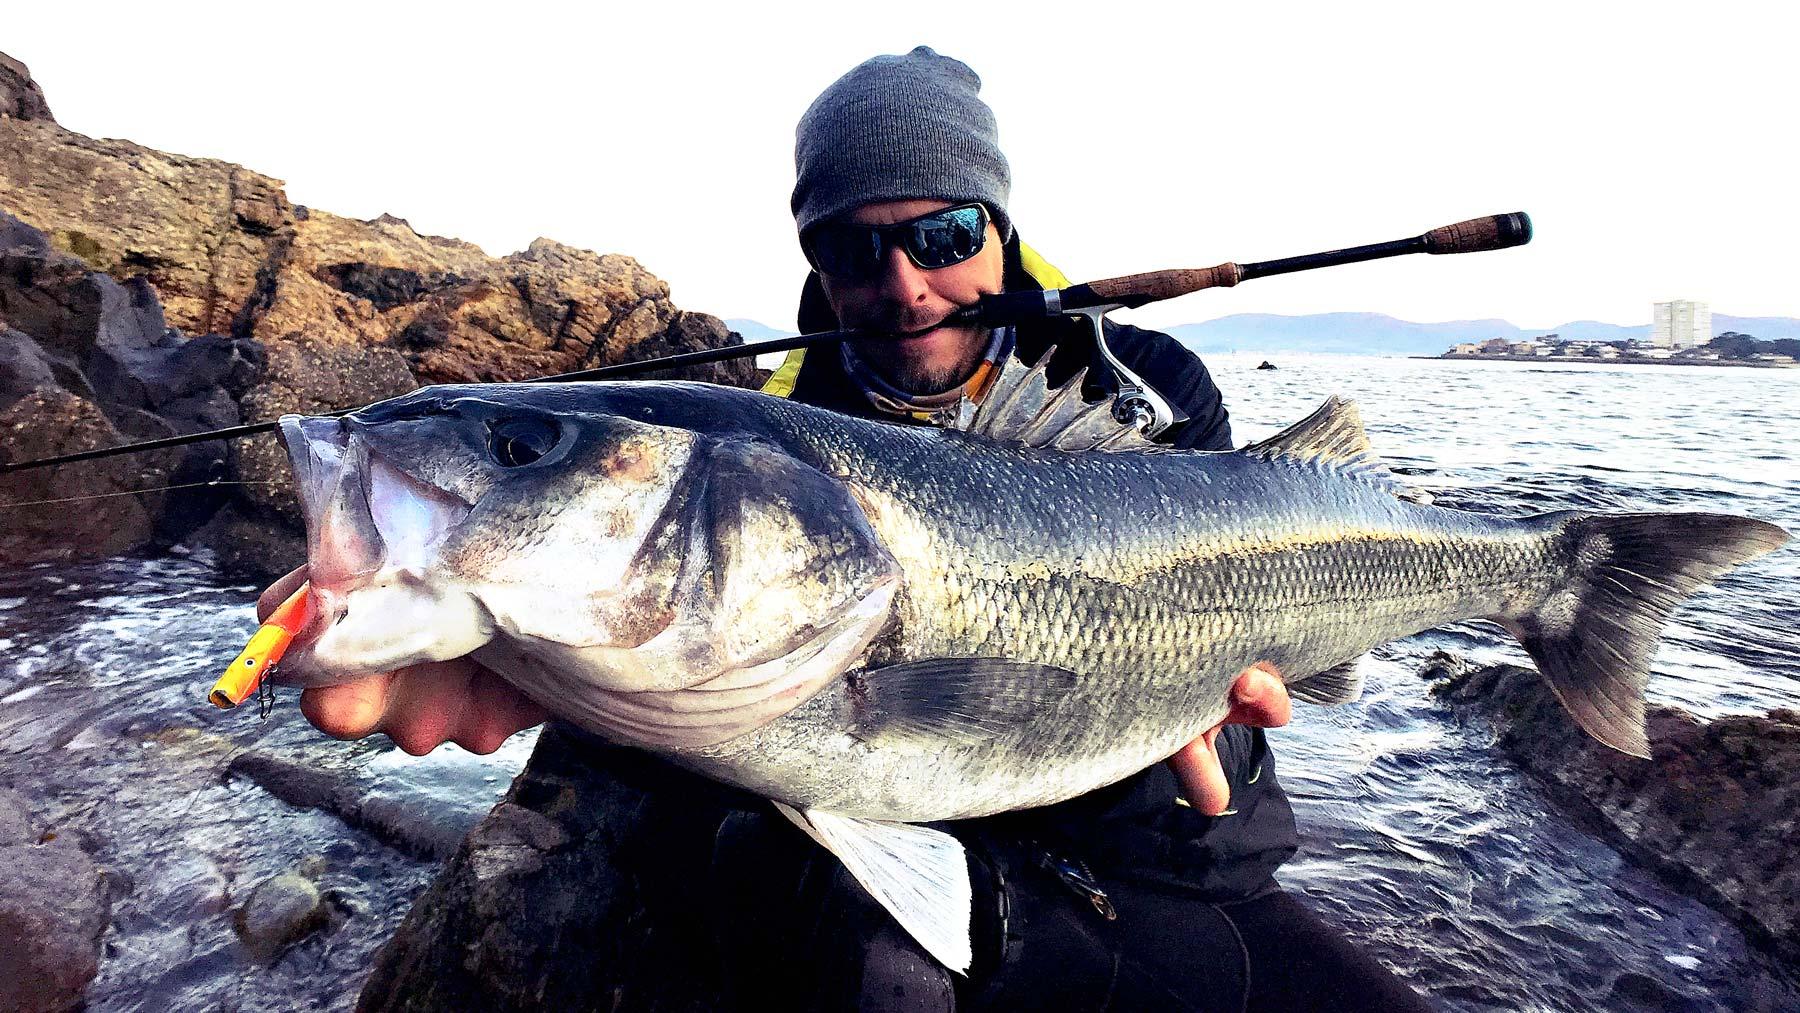 KRID Lifetime Fishing - Lifetime Flies and Lures